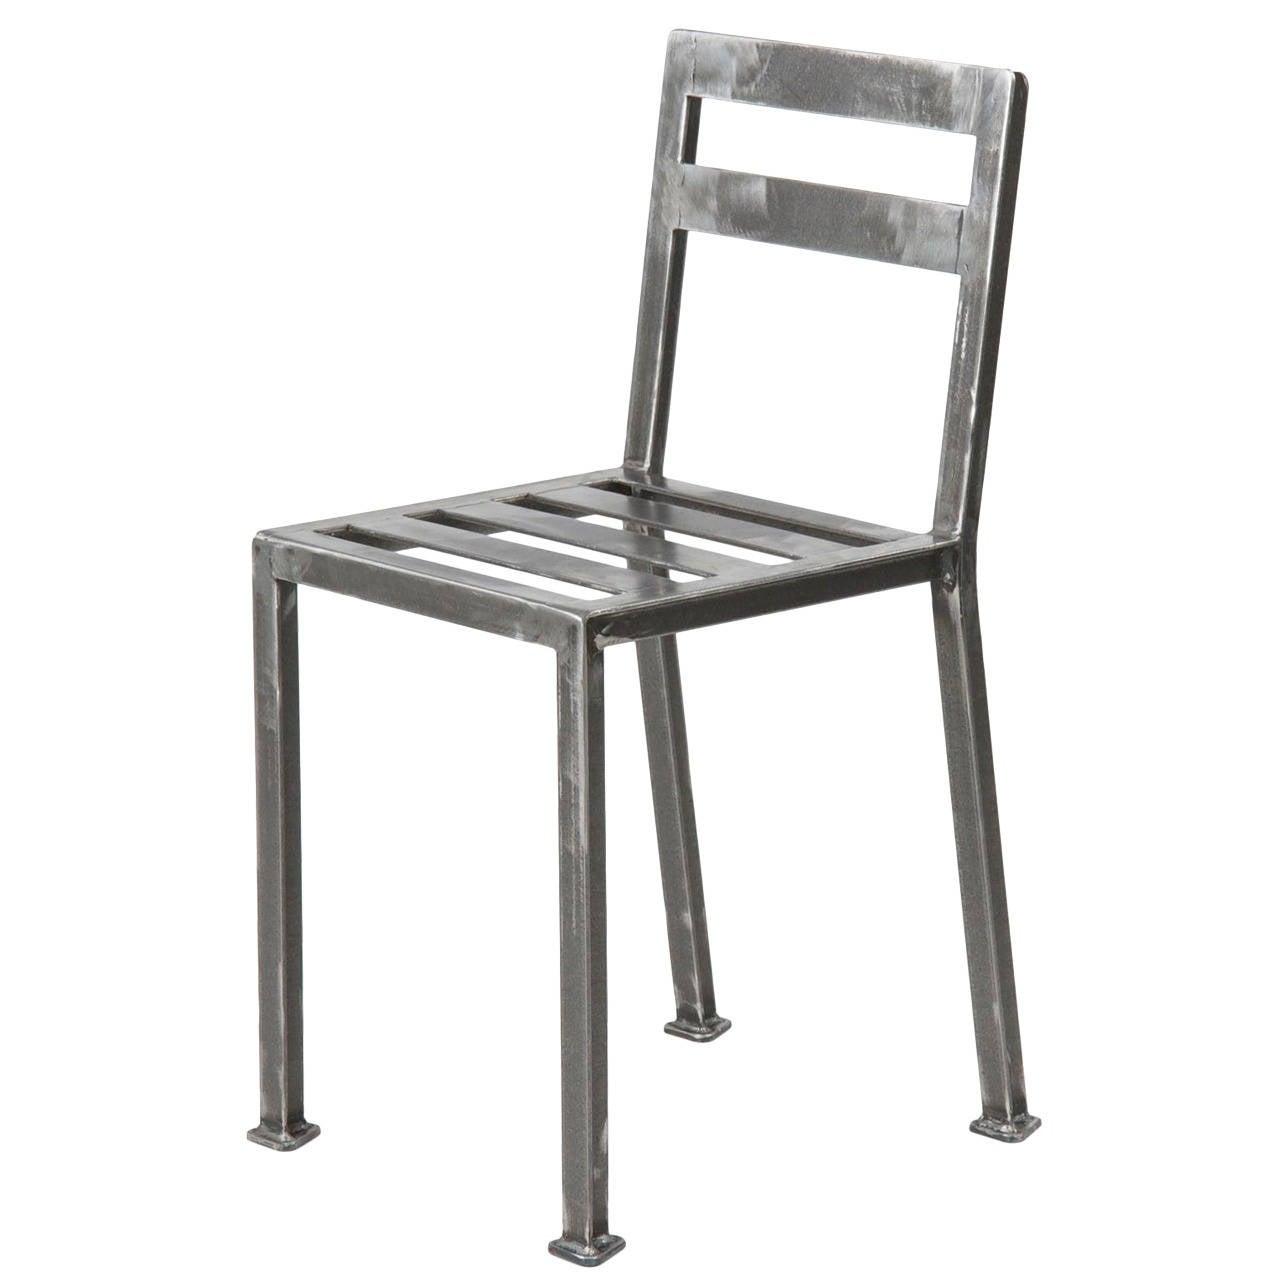 Industrial Style Welded Steel Minimalist Dining Side Chair